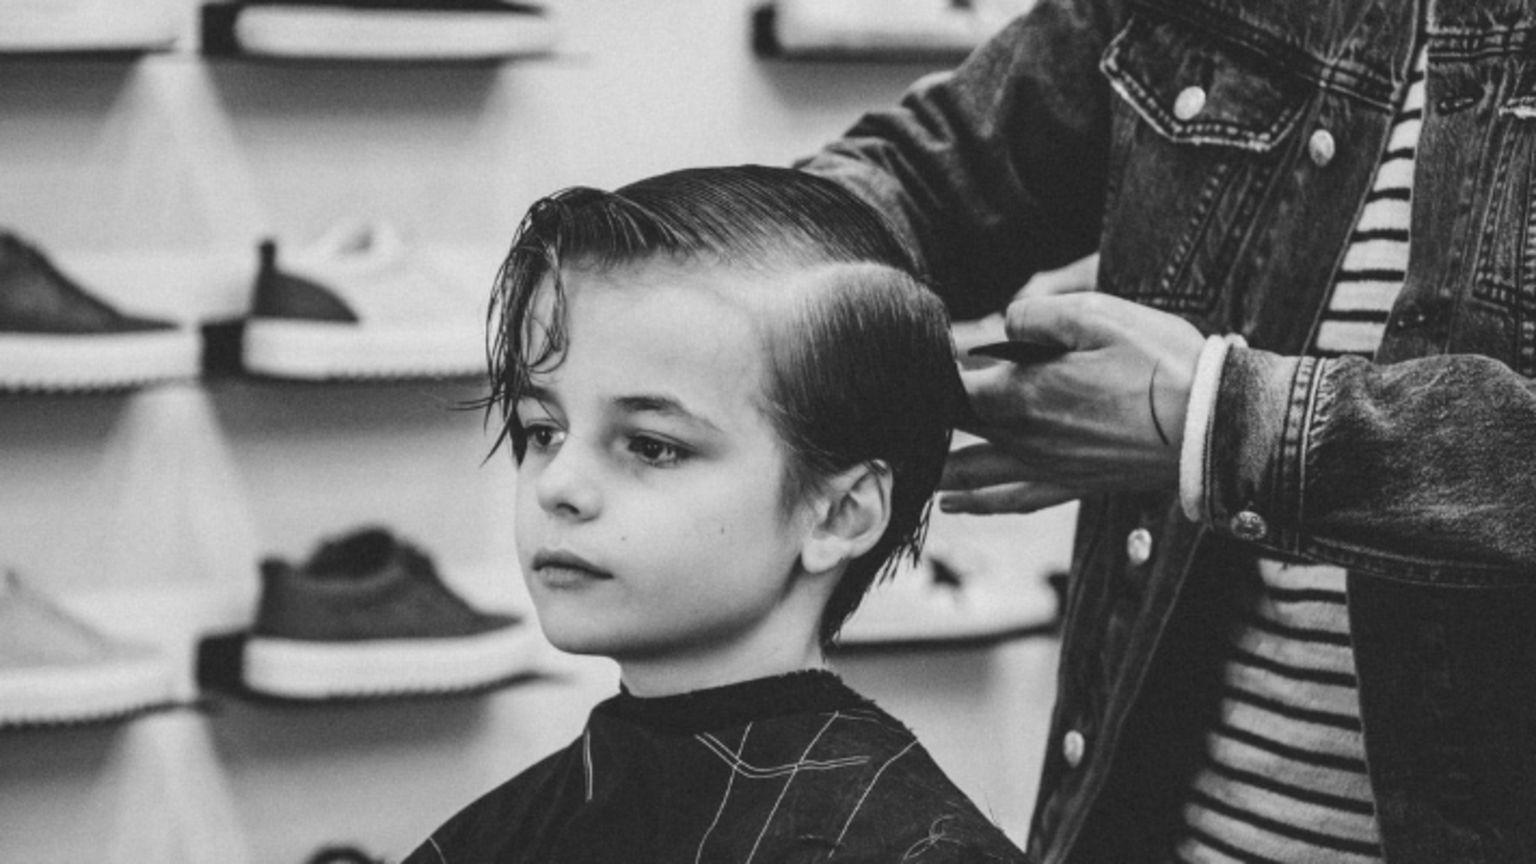 Child Friendly Hair Salon